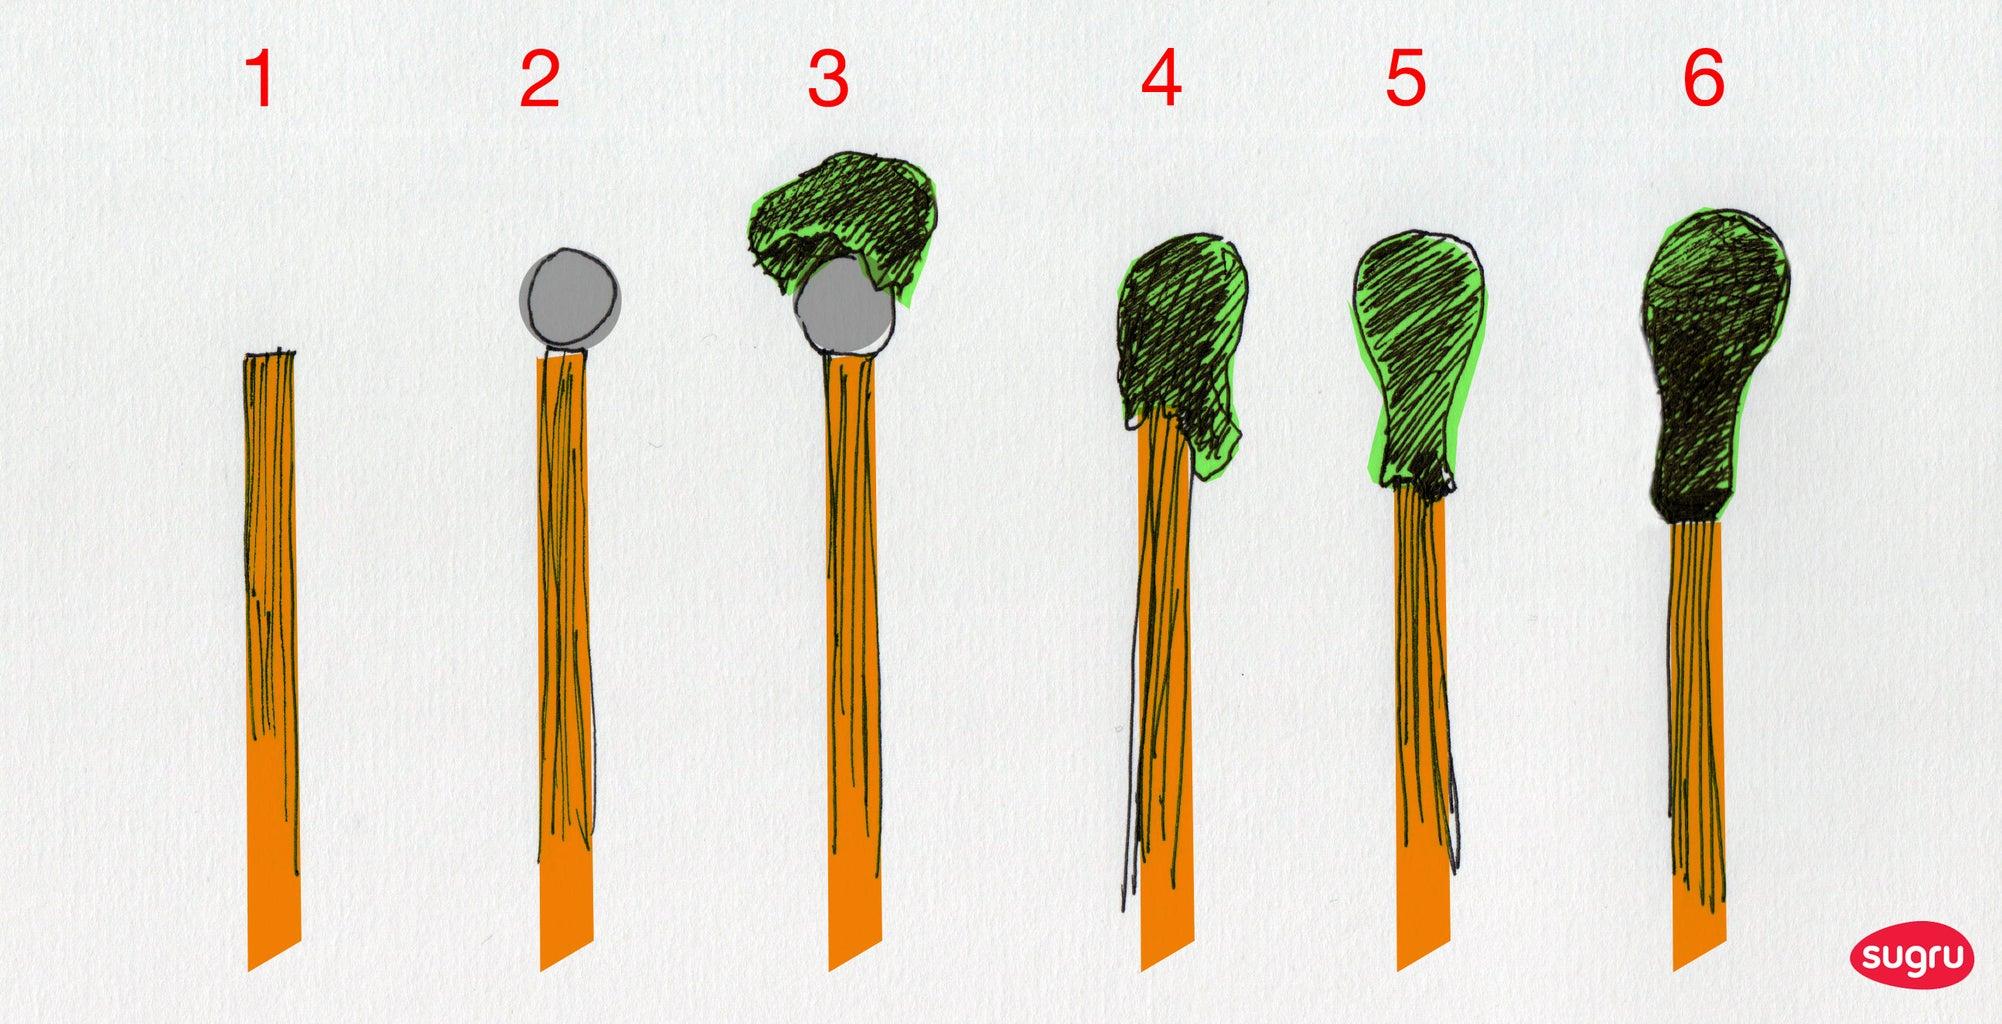 Assemble Sticks + Magnet + Sugru